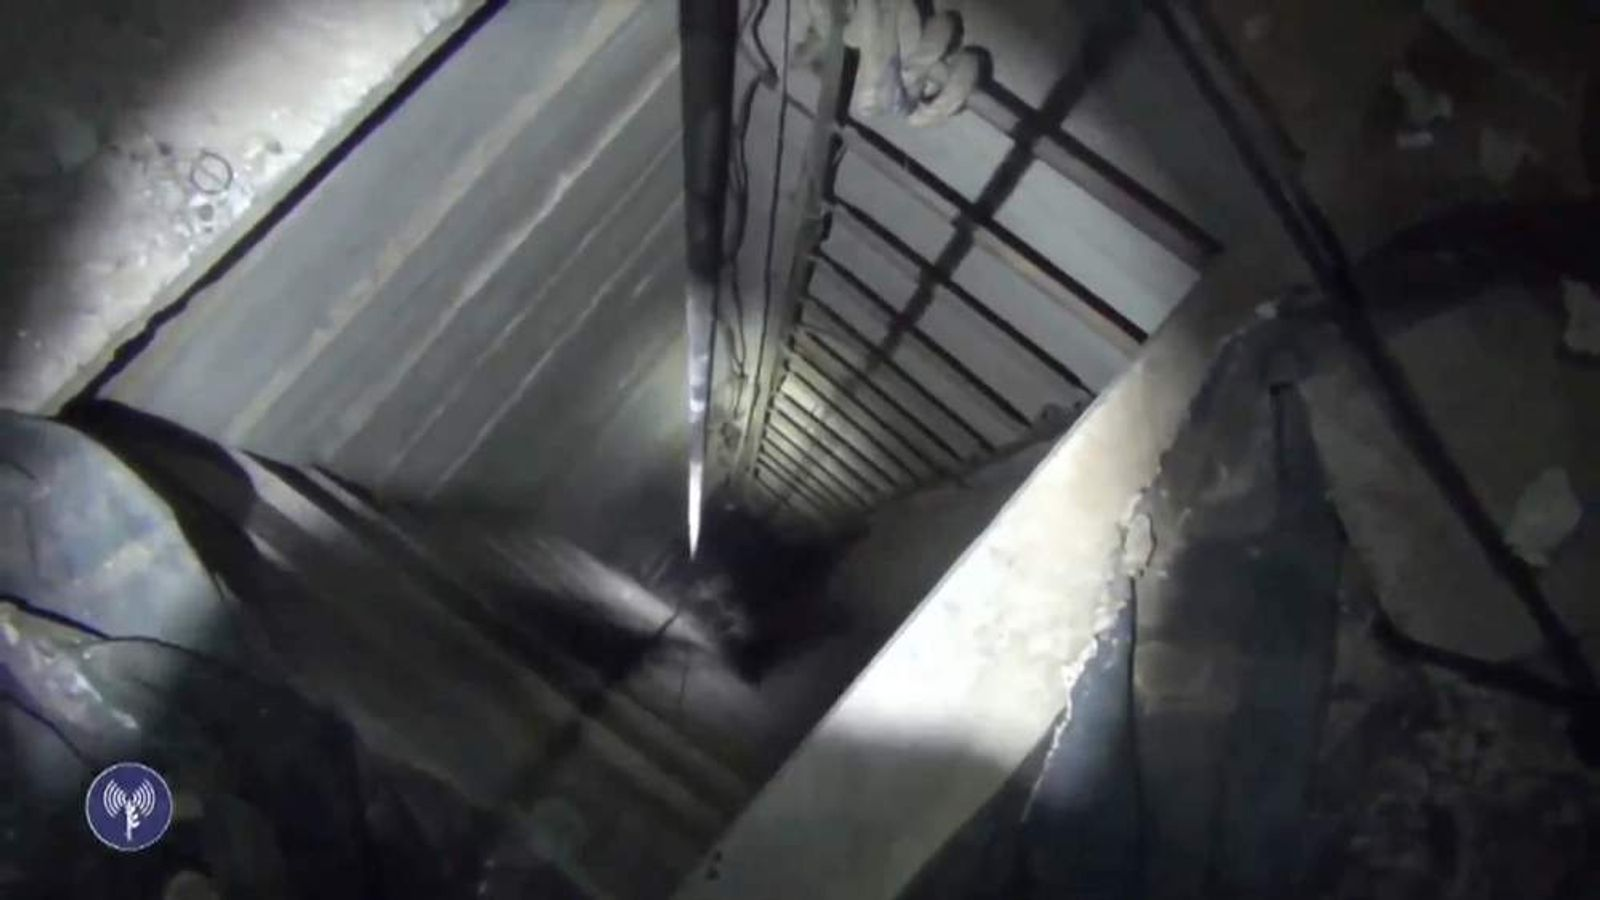 Indie tunnels